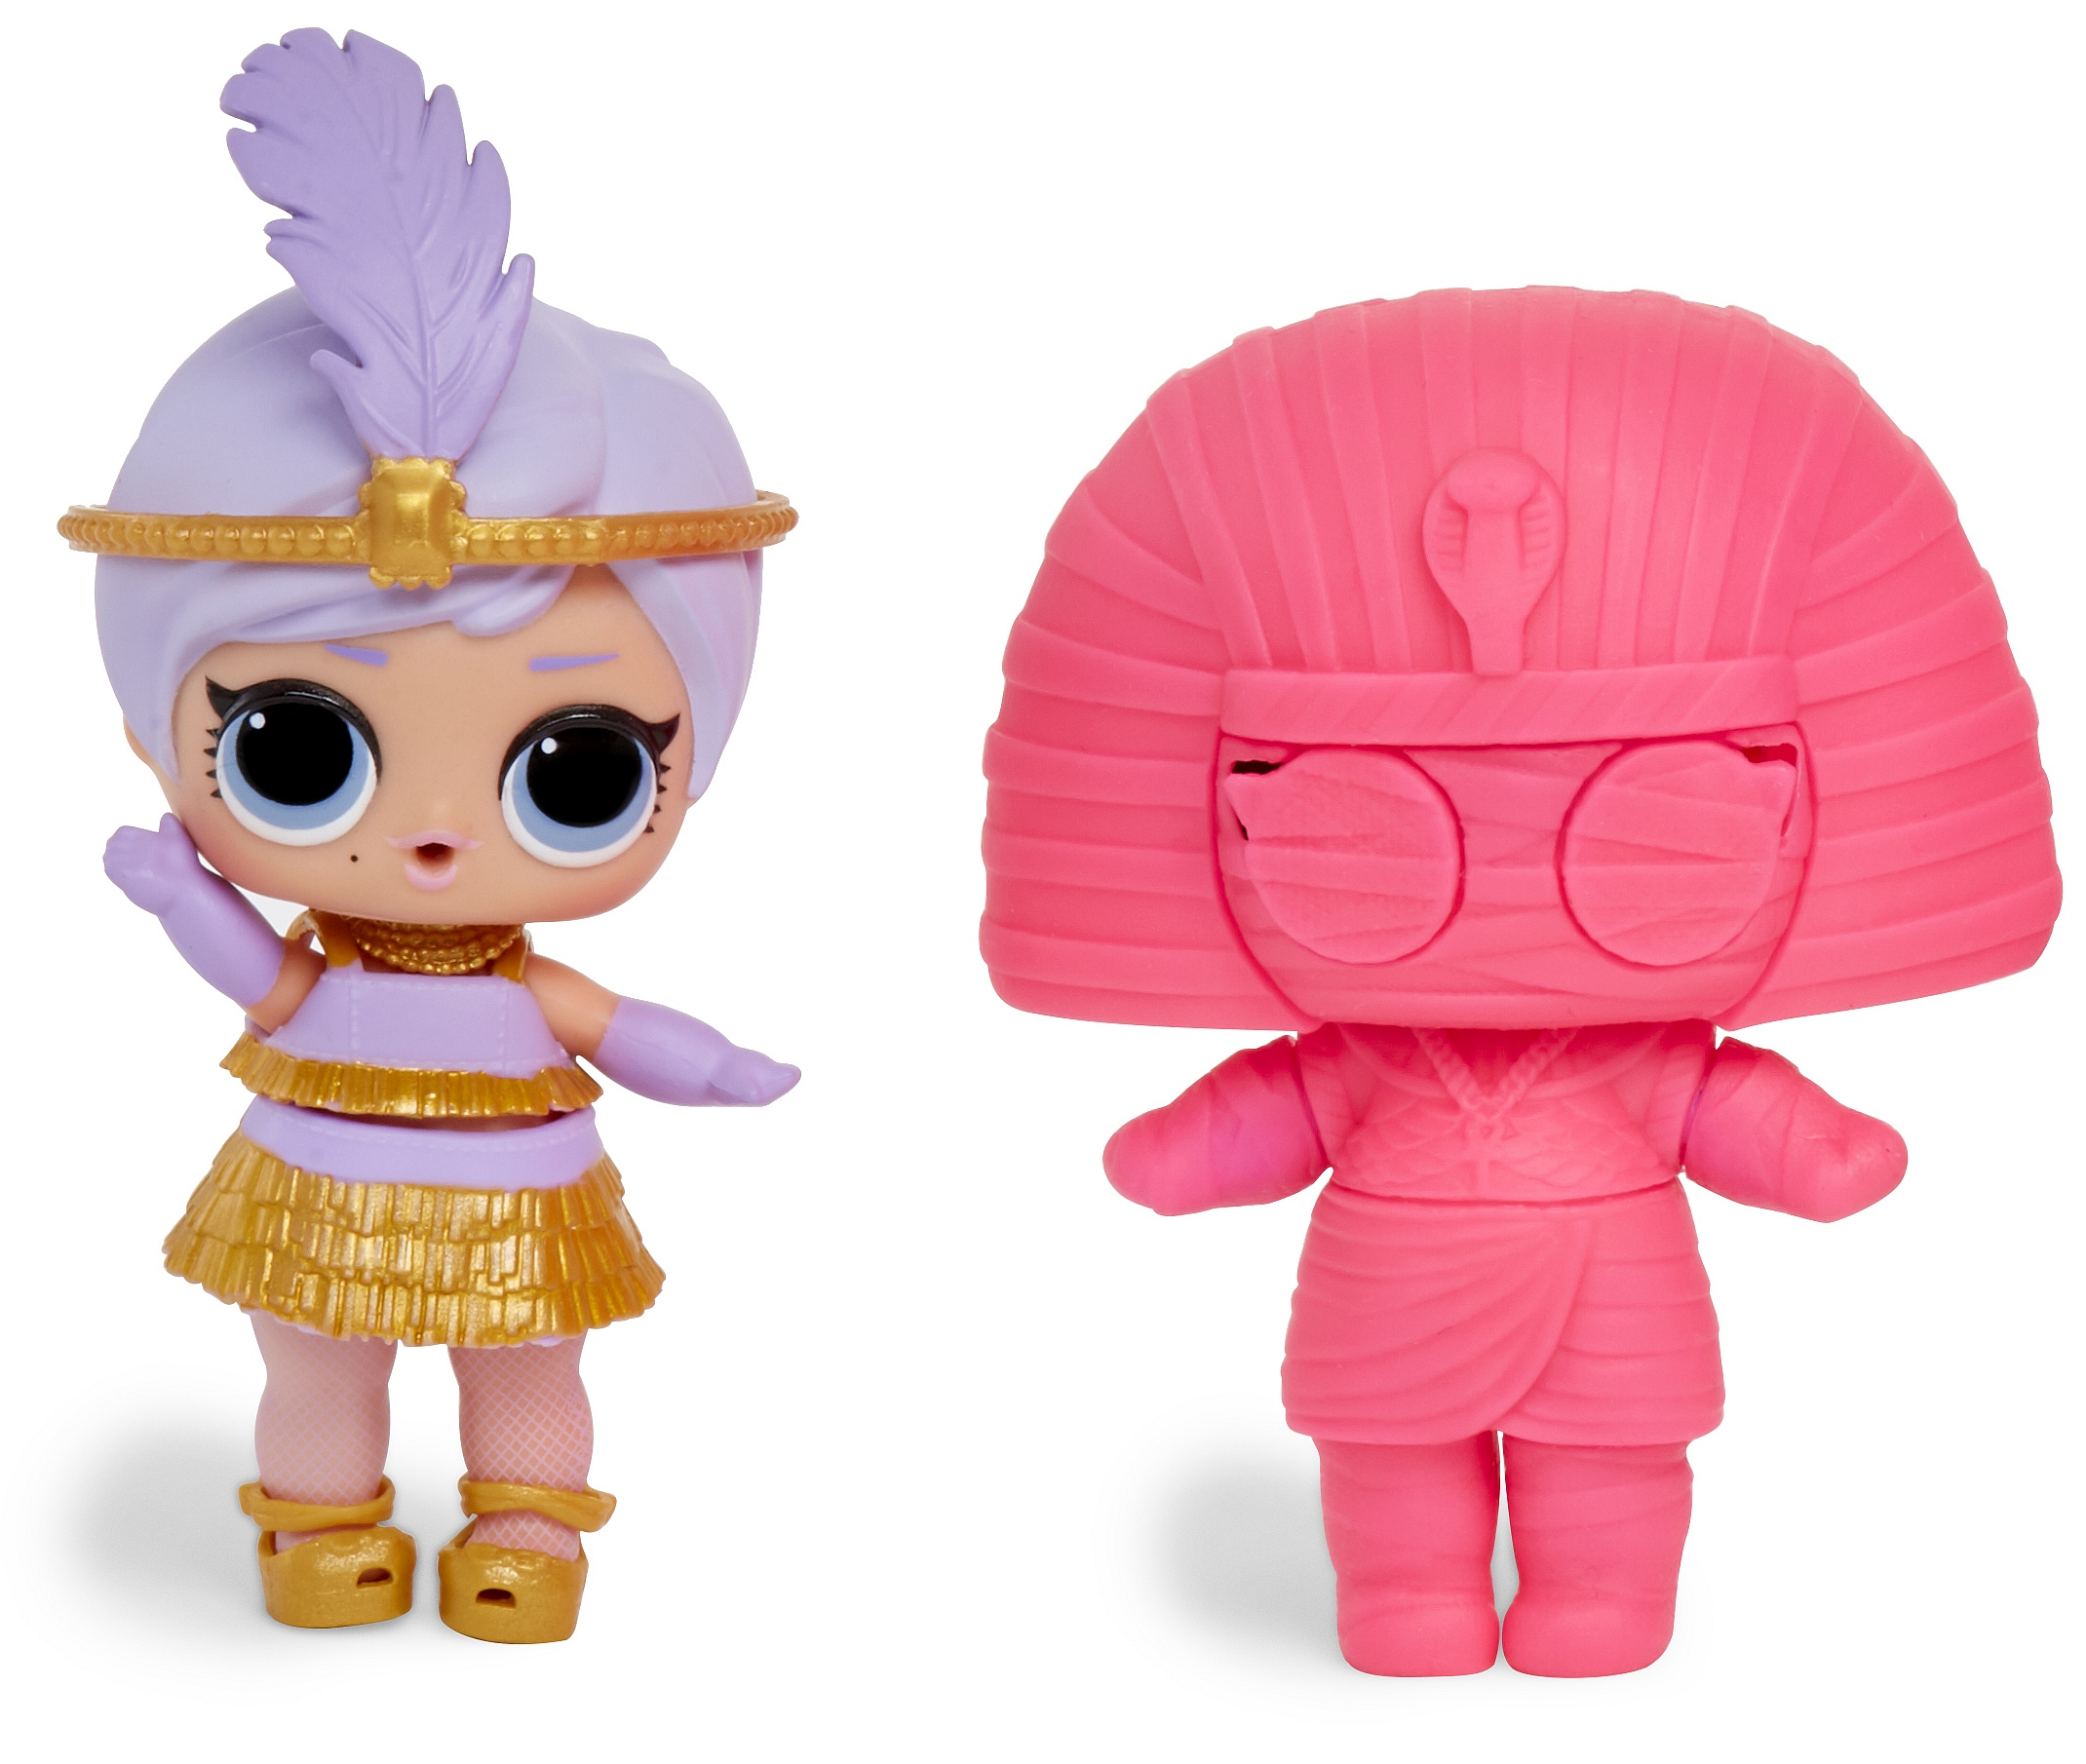 MGAE_LOLSurprise_UnderWraps_Doll 1